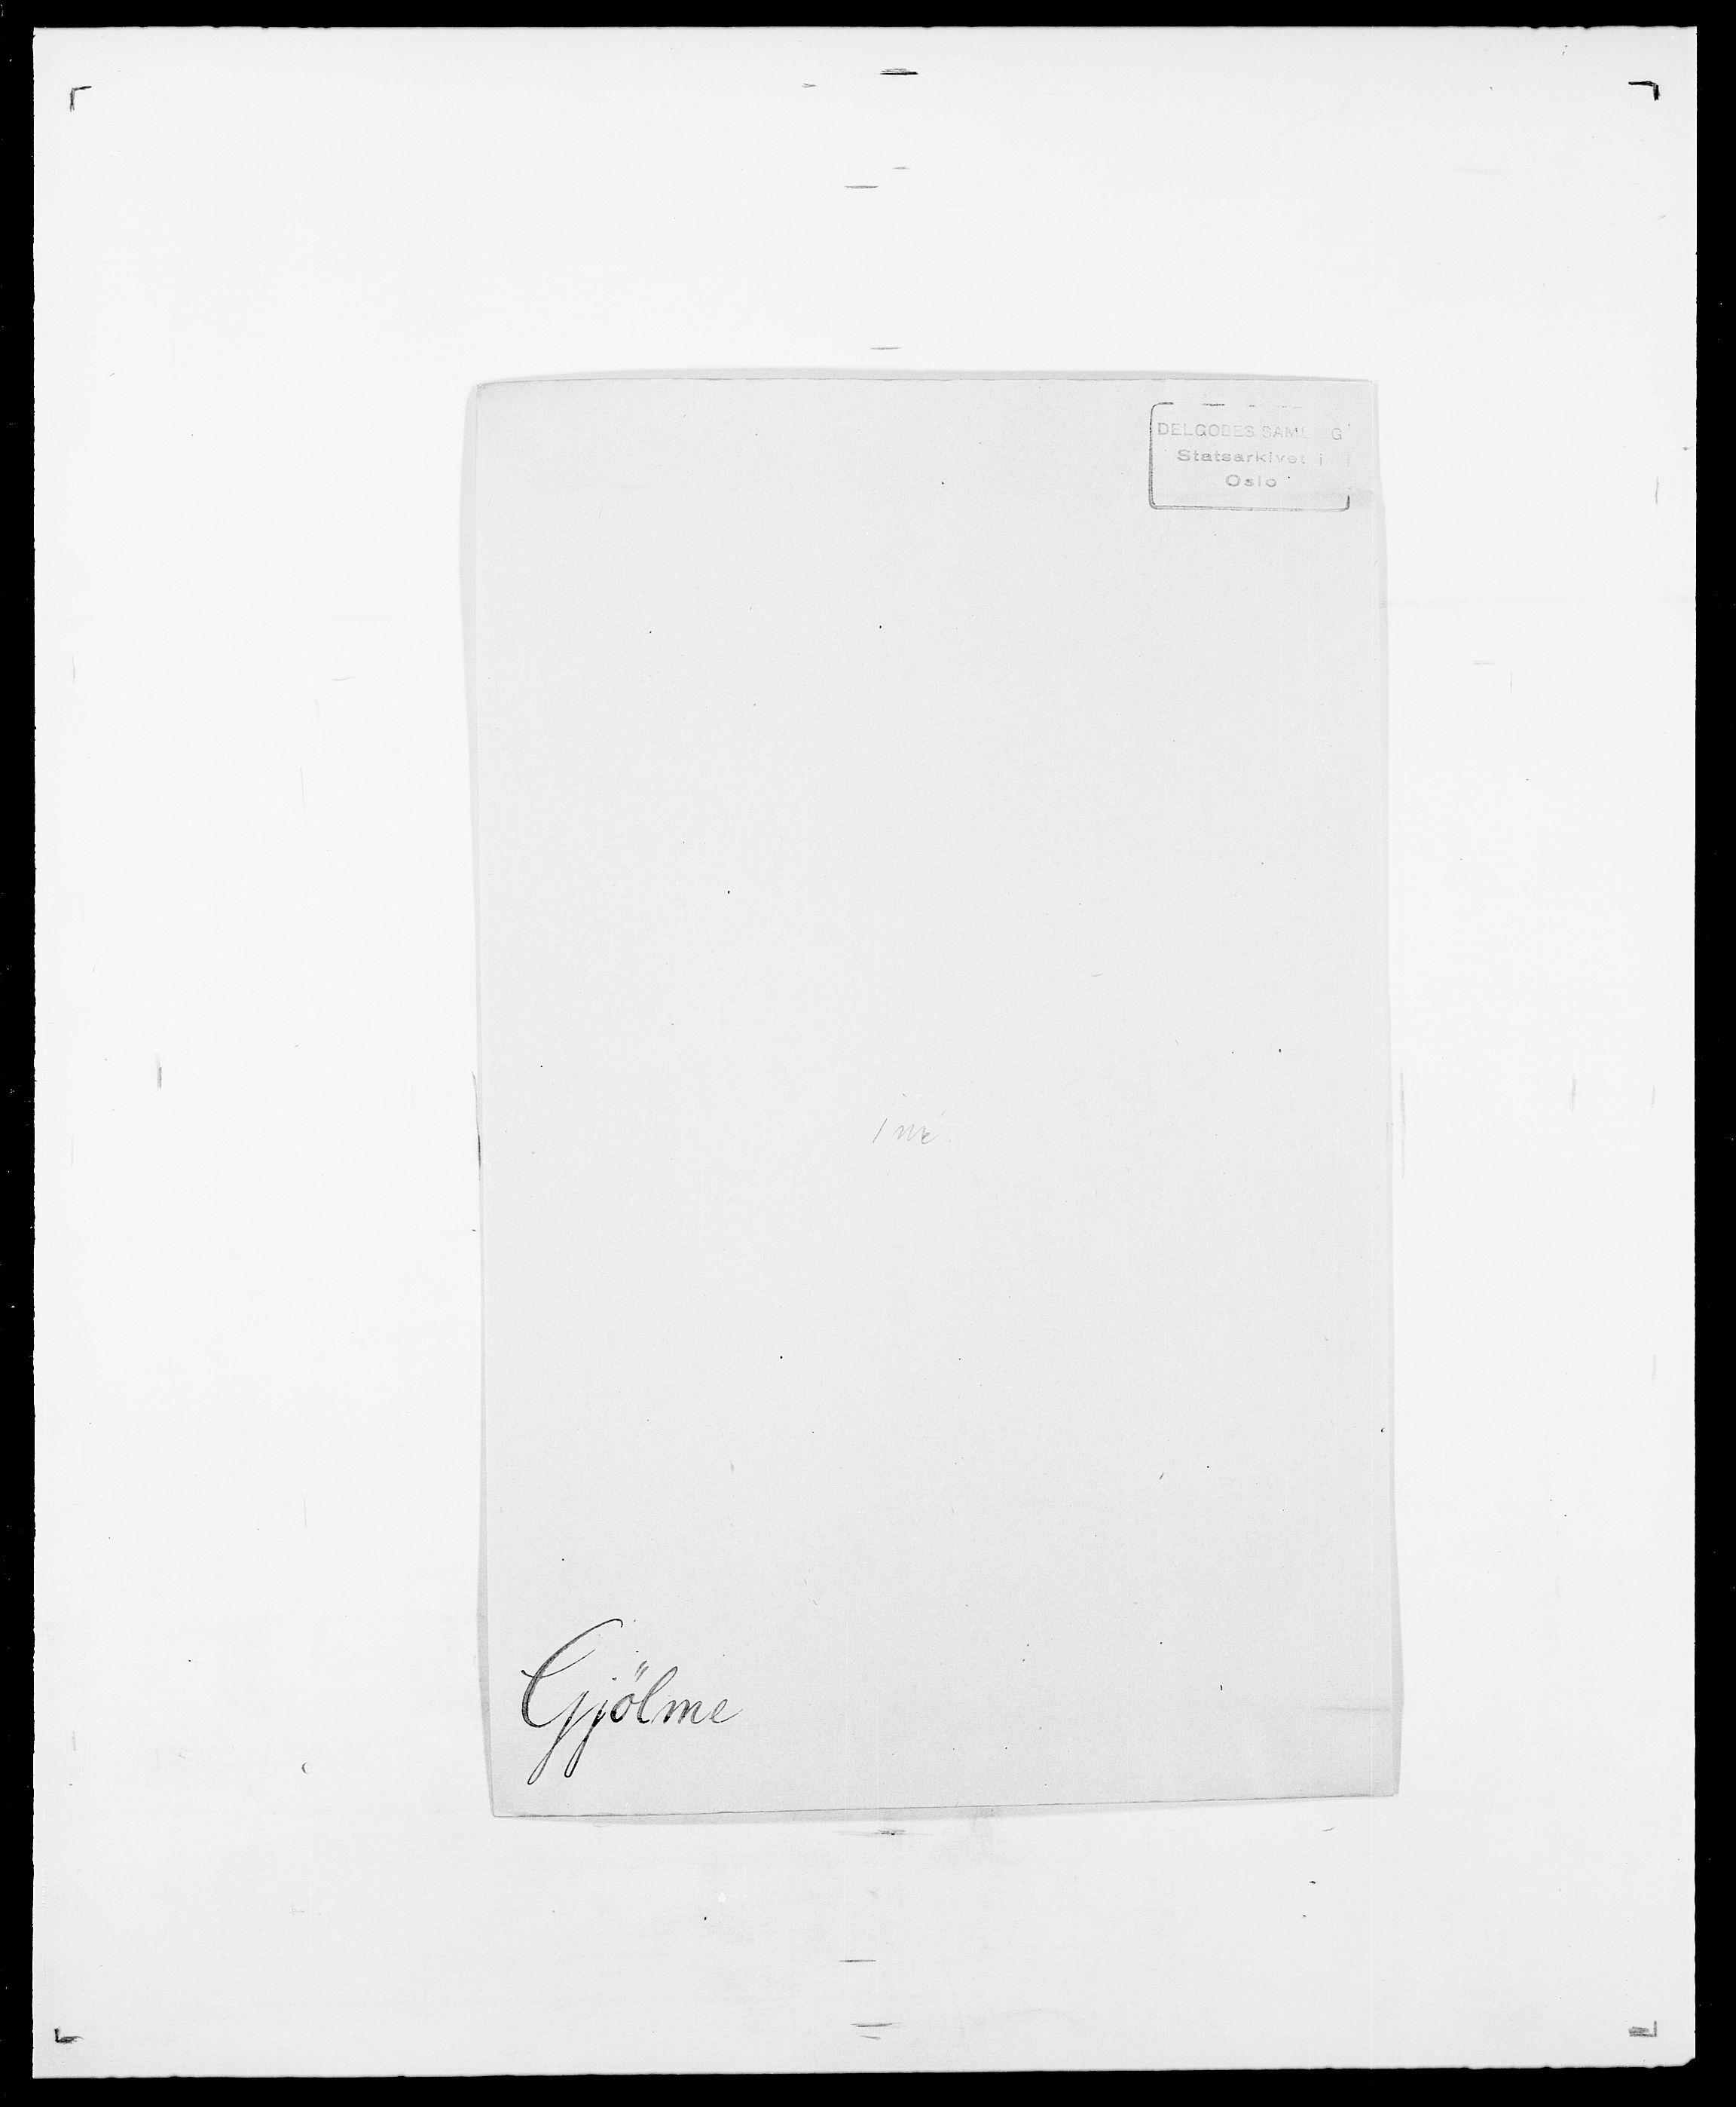 SAO, Delgobe, Charles Antoine - samling, D/Da/L0014: Giebdhausen - Grip, s. 215